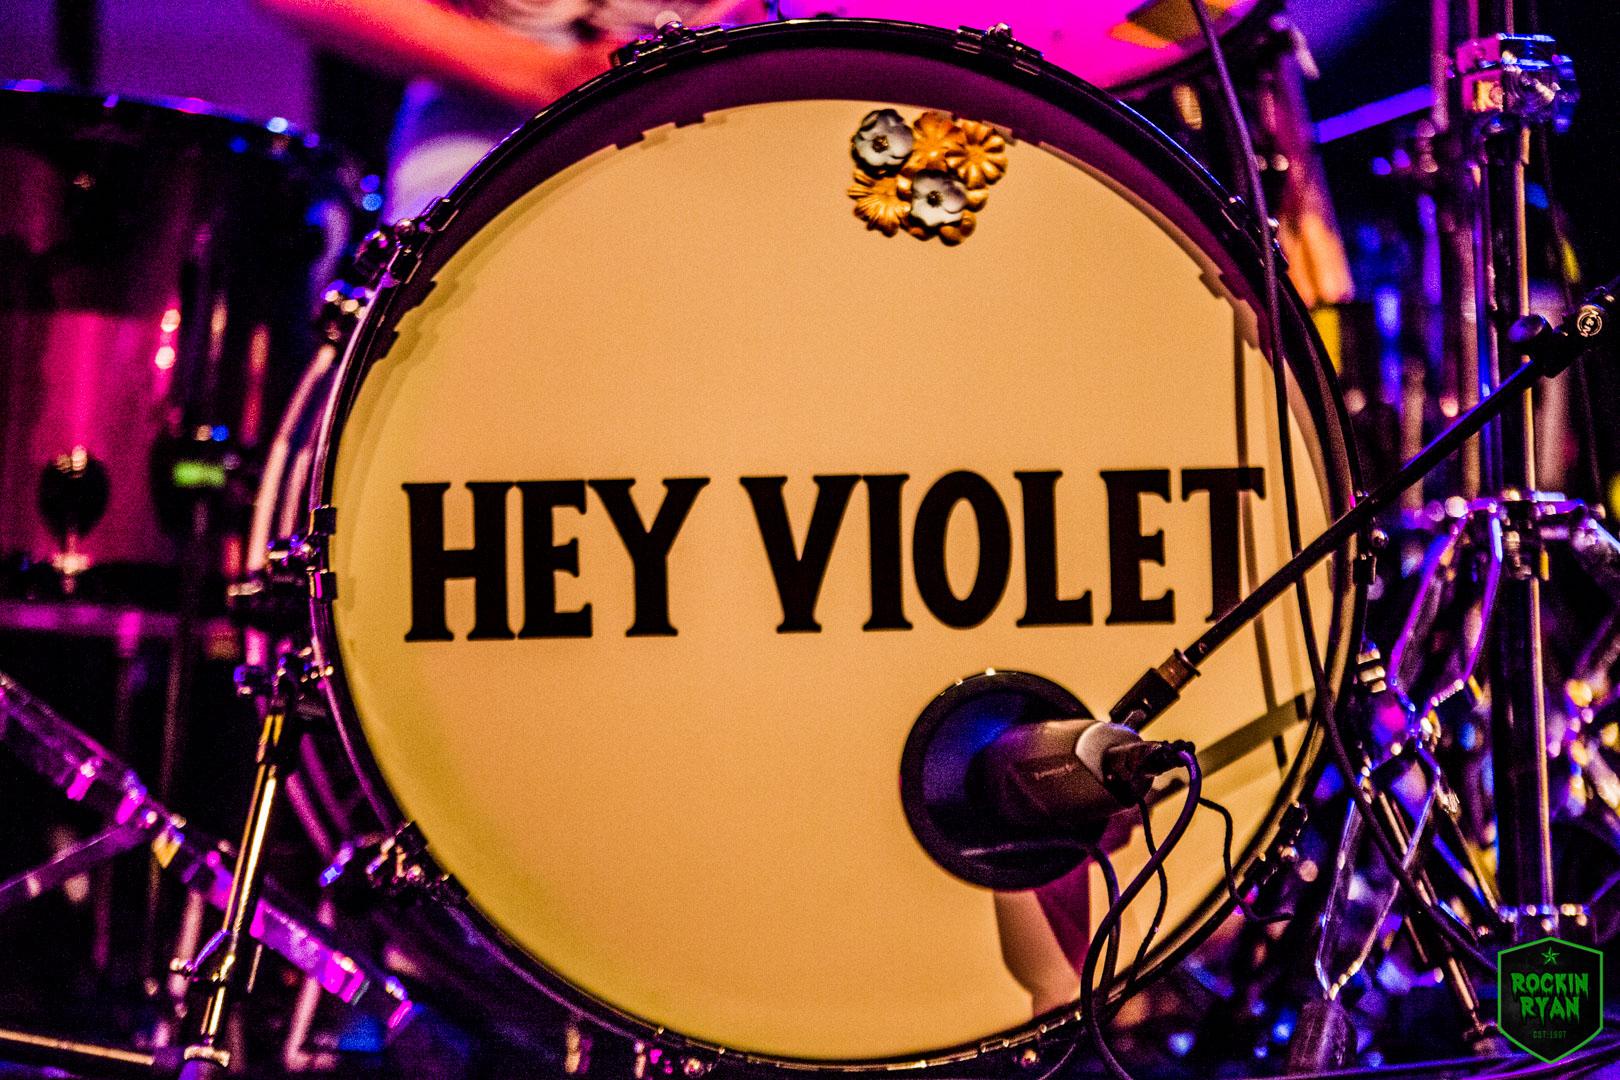 Hey VioletSF-6147